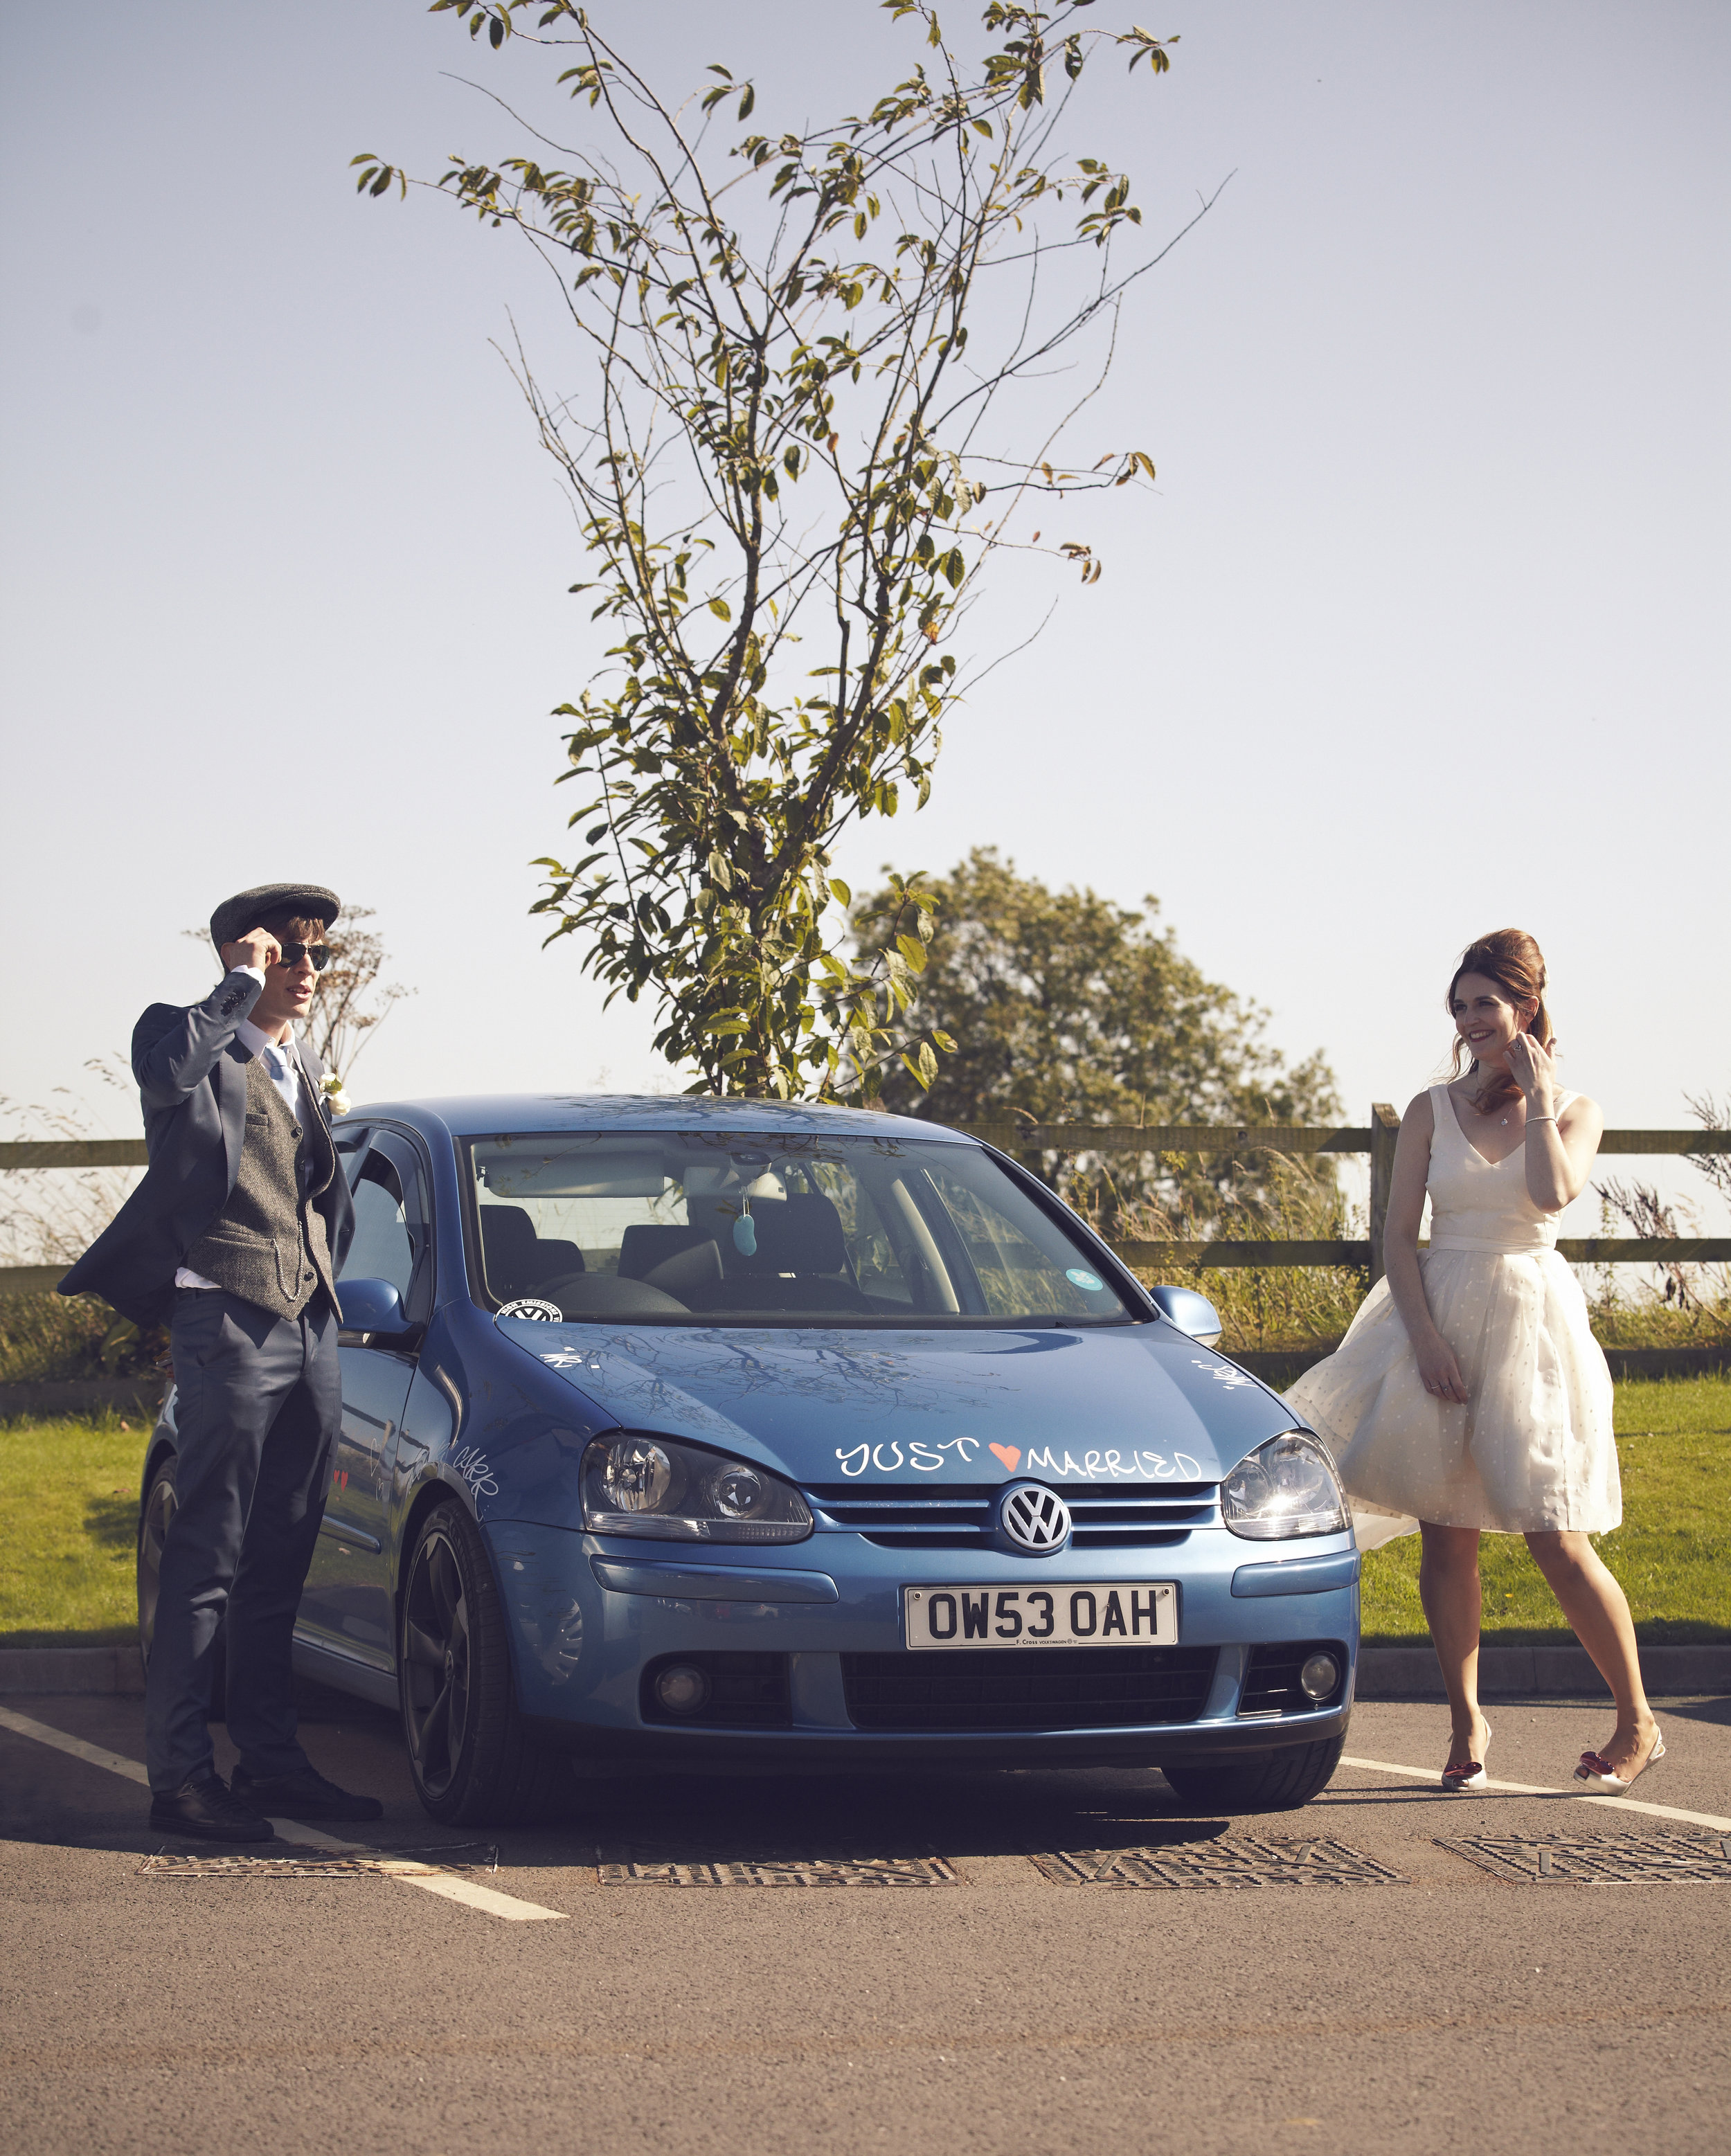 Suzi-Matlock-Polka-Dot-Bespoke-Wedding-Dress-High-Low-Susanna-Greening-Designs-Derbyshire-15